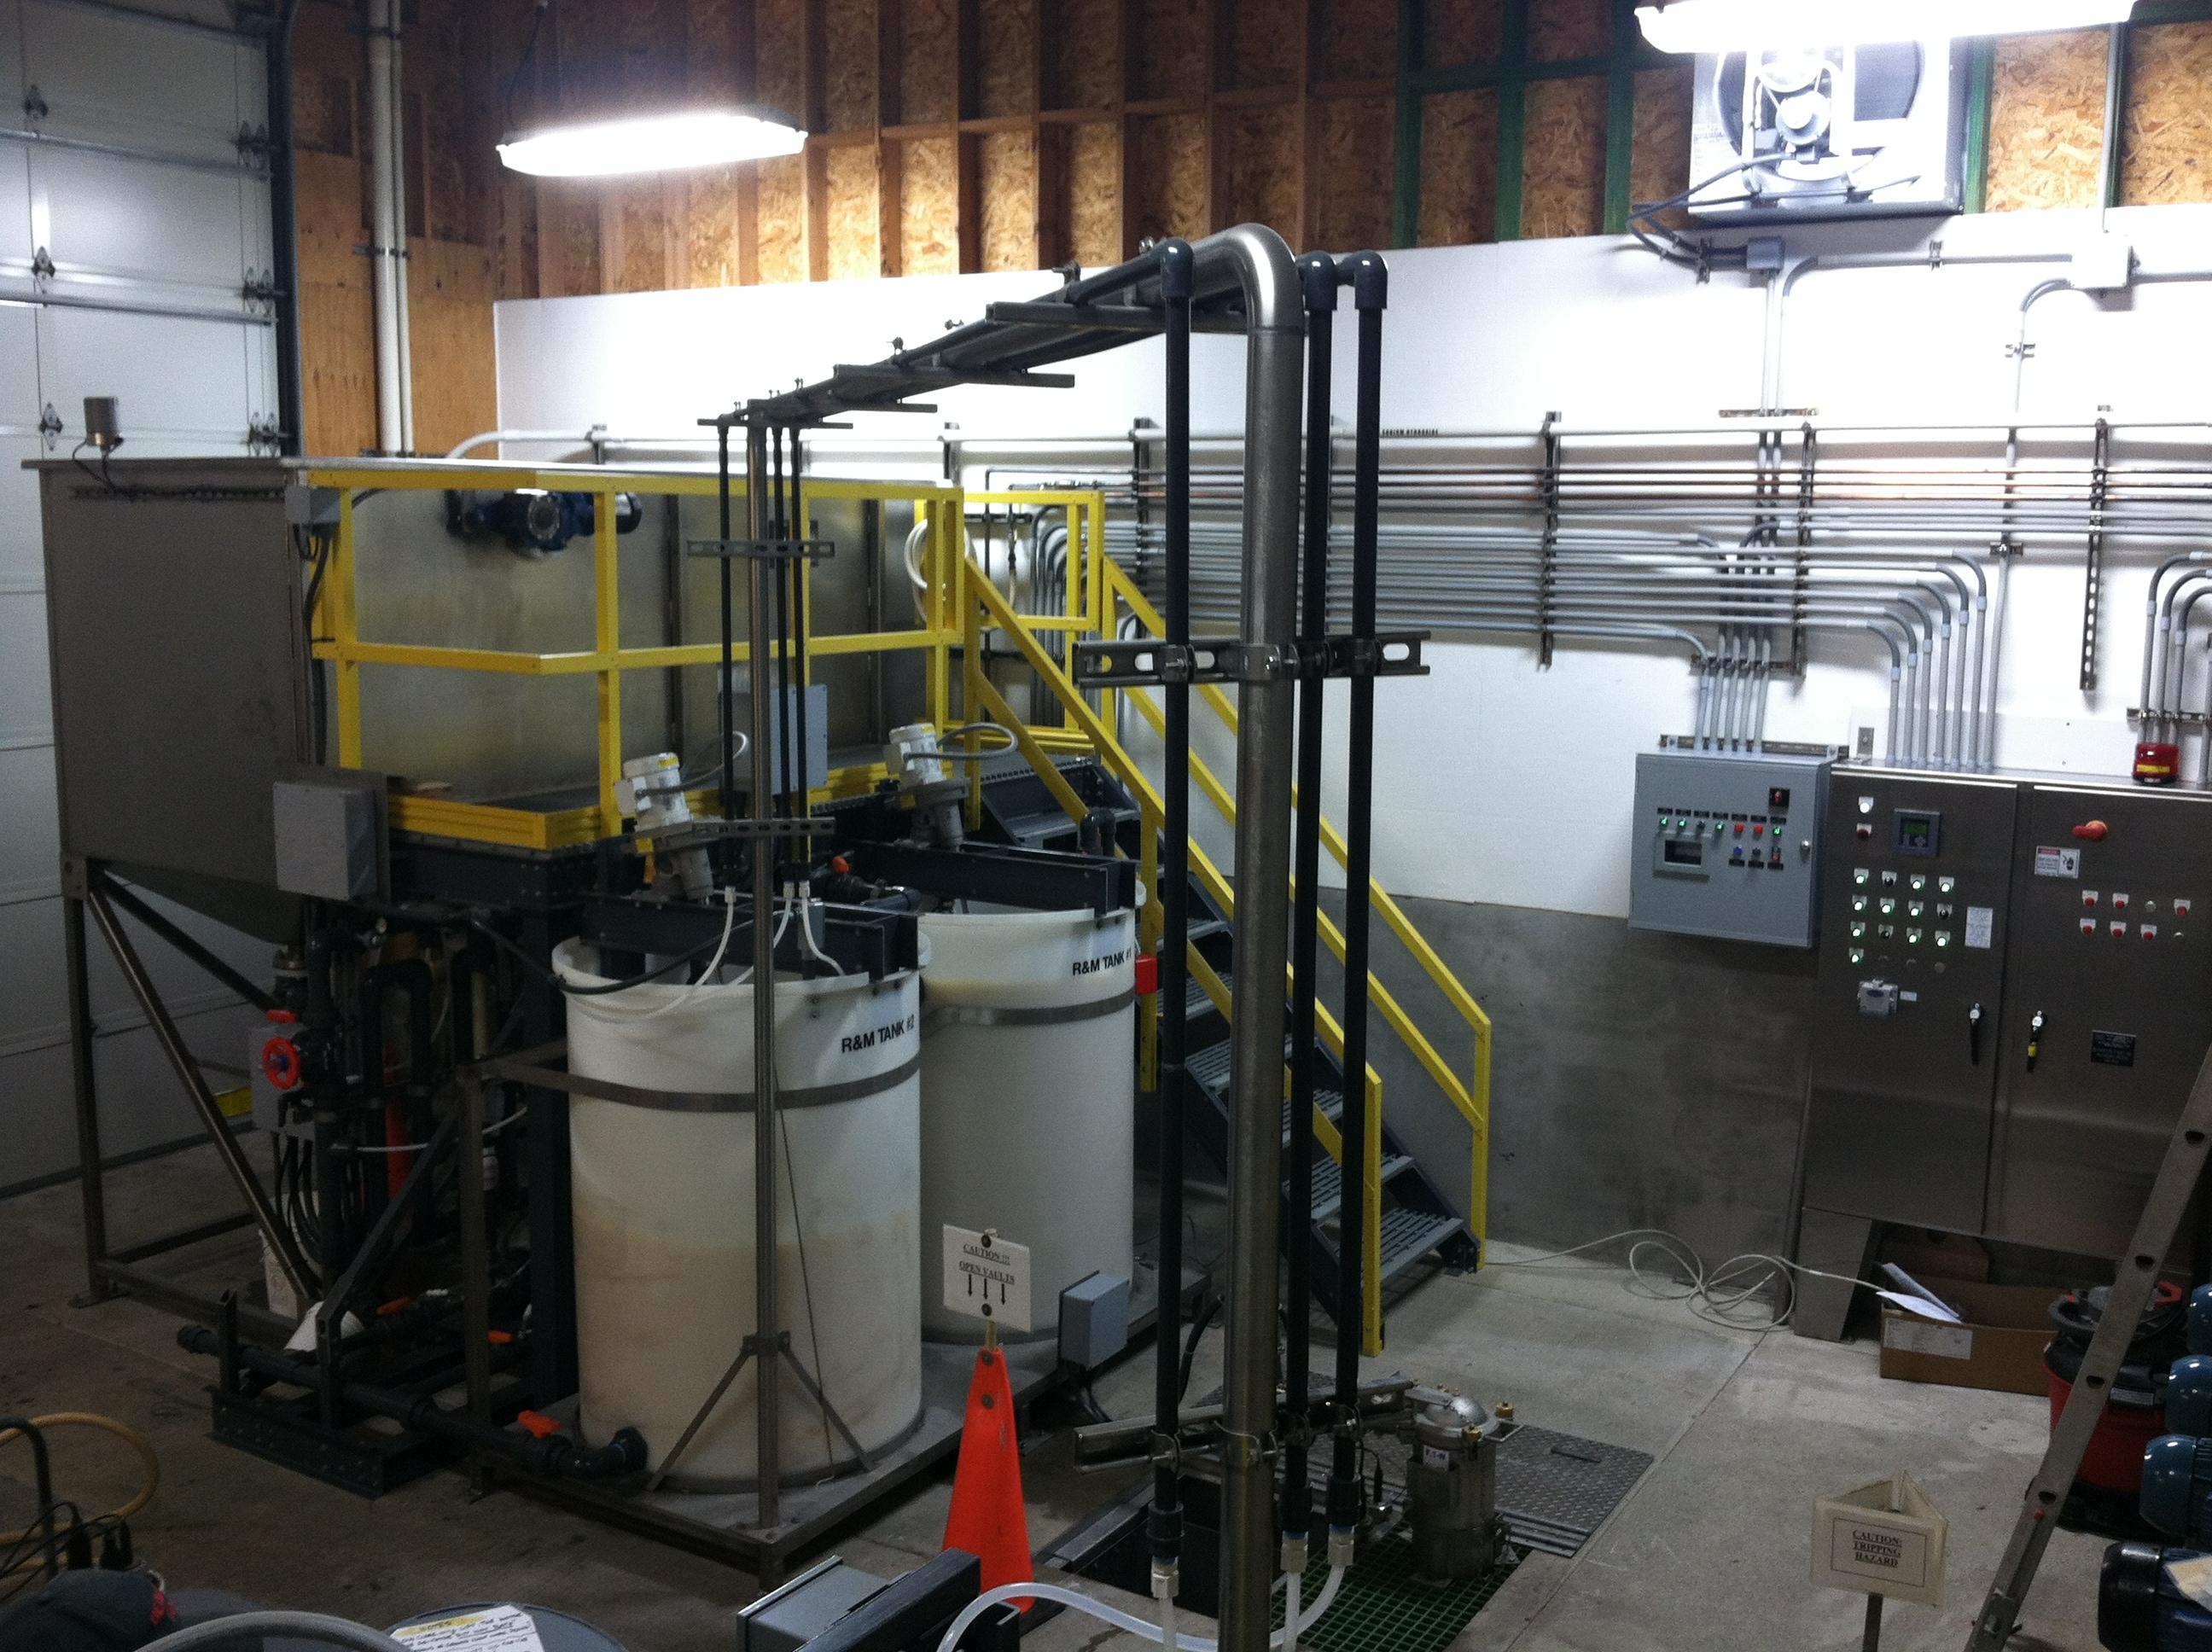 Beckart Sistema de Tratamiento de Aguas Residuales de Flotación Continua